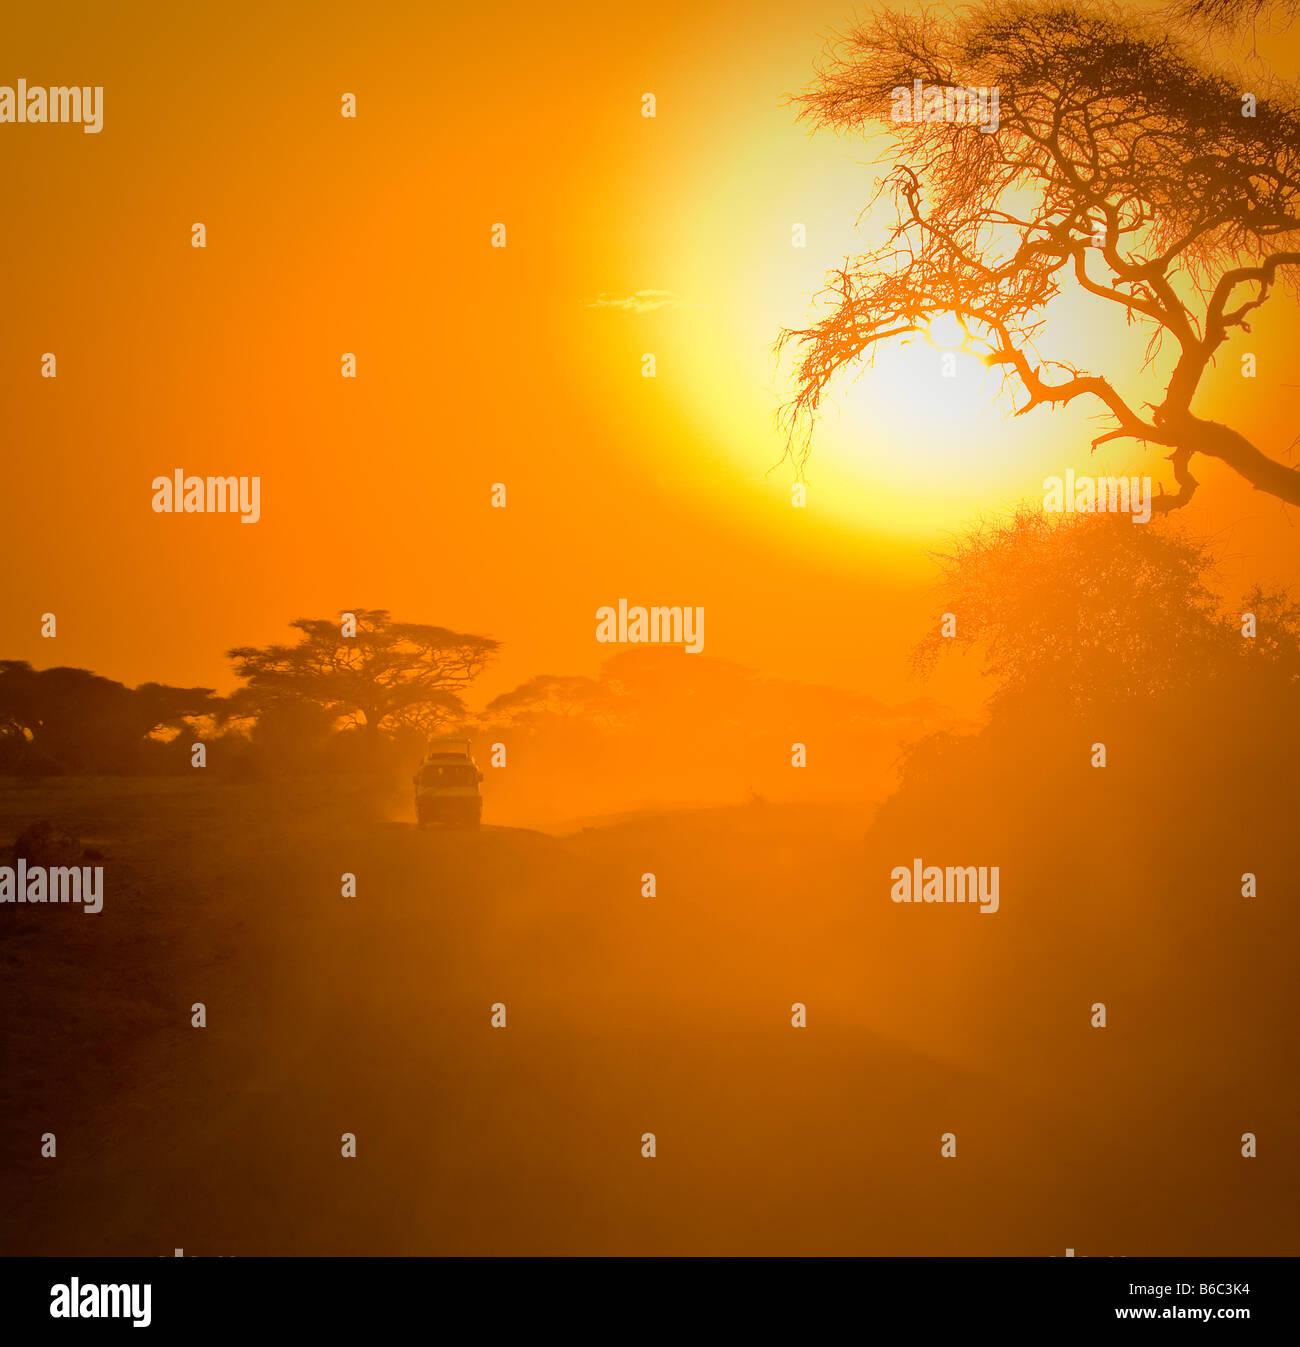 safari jeep driving through savannah in the sunset Stock Photo